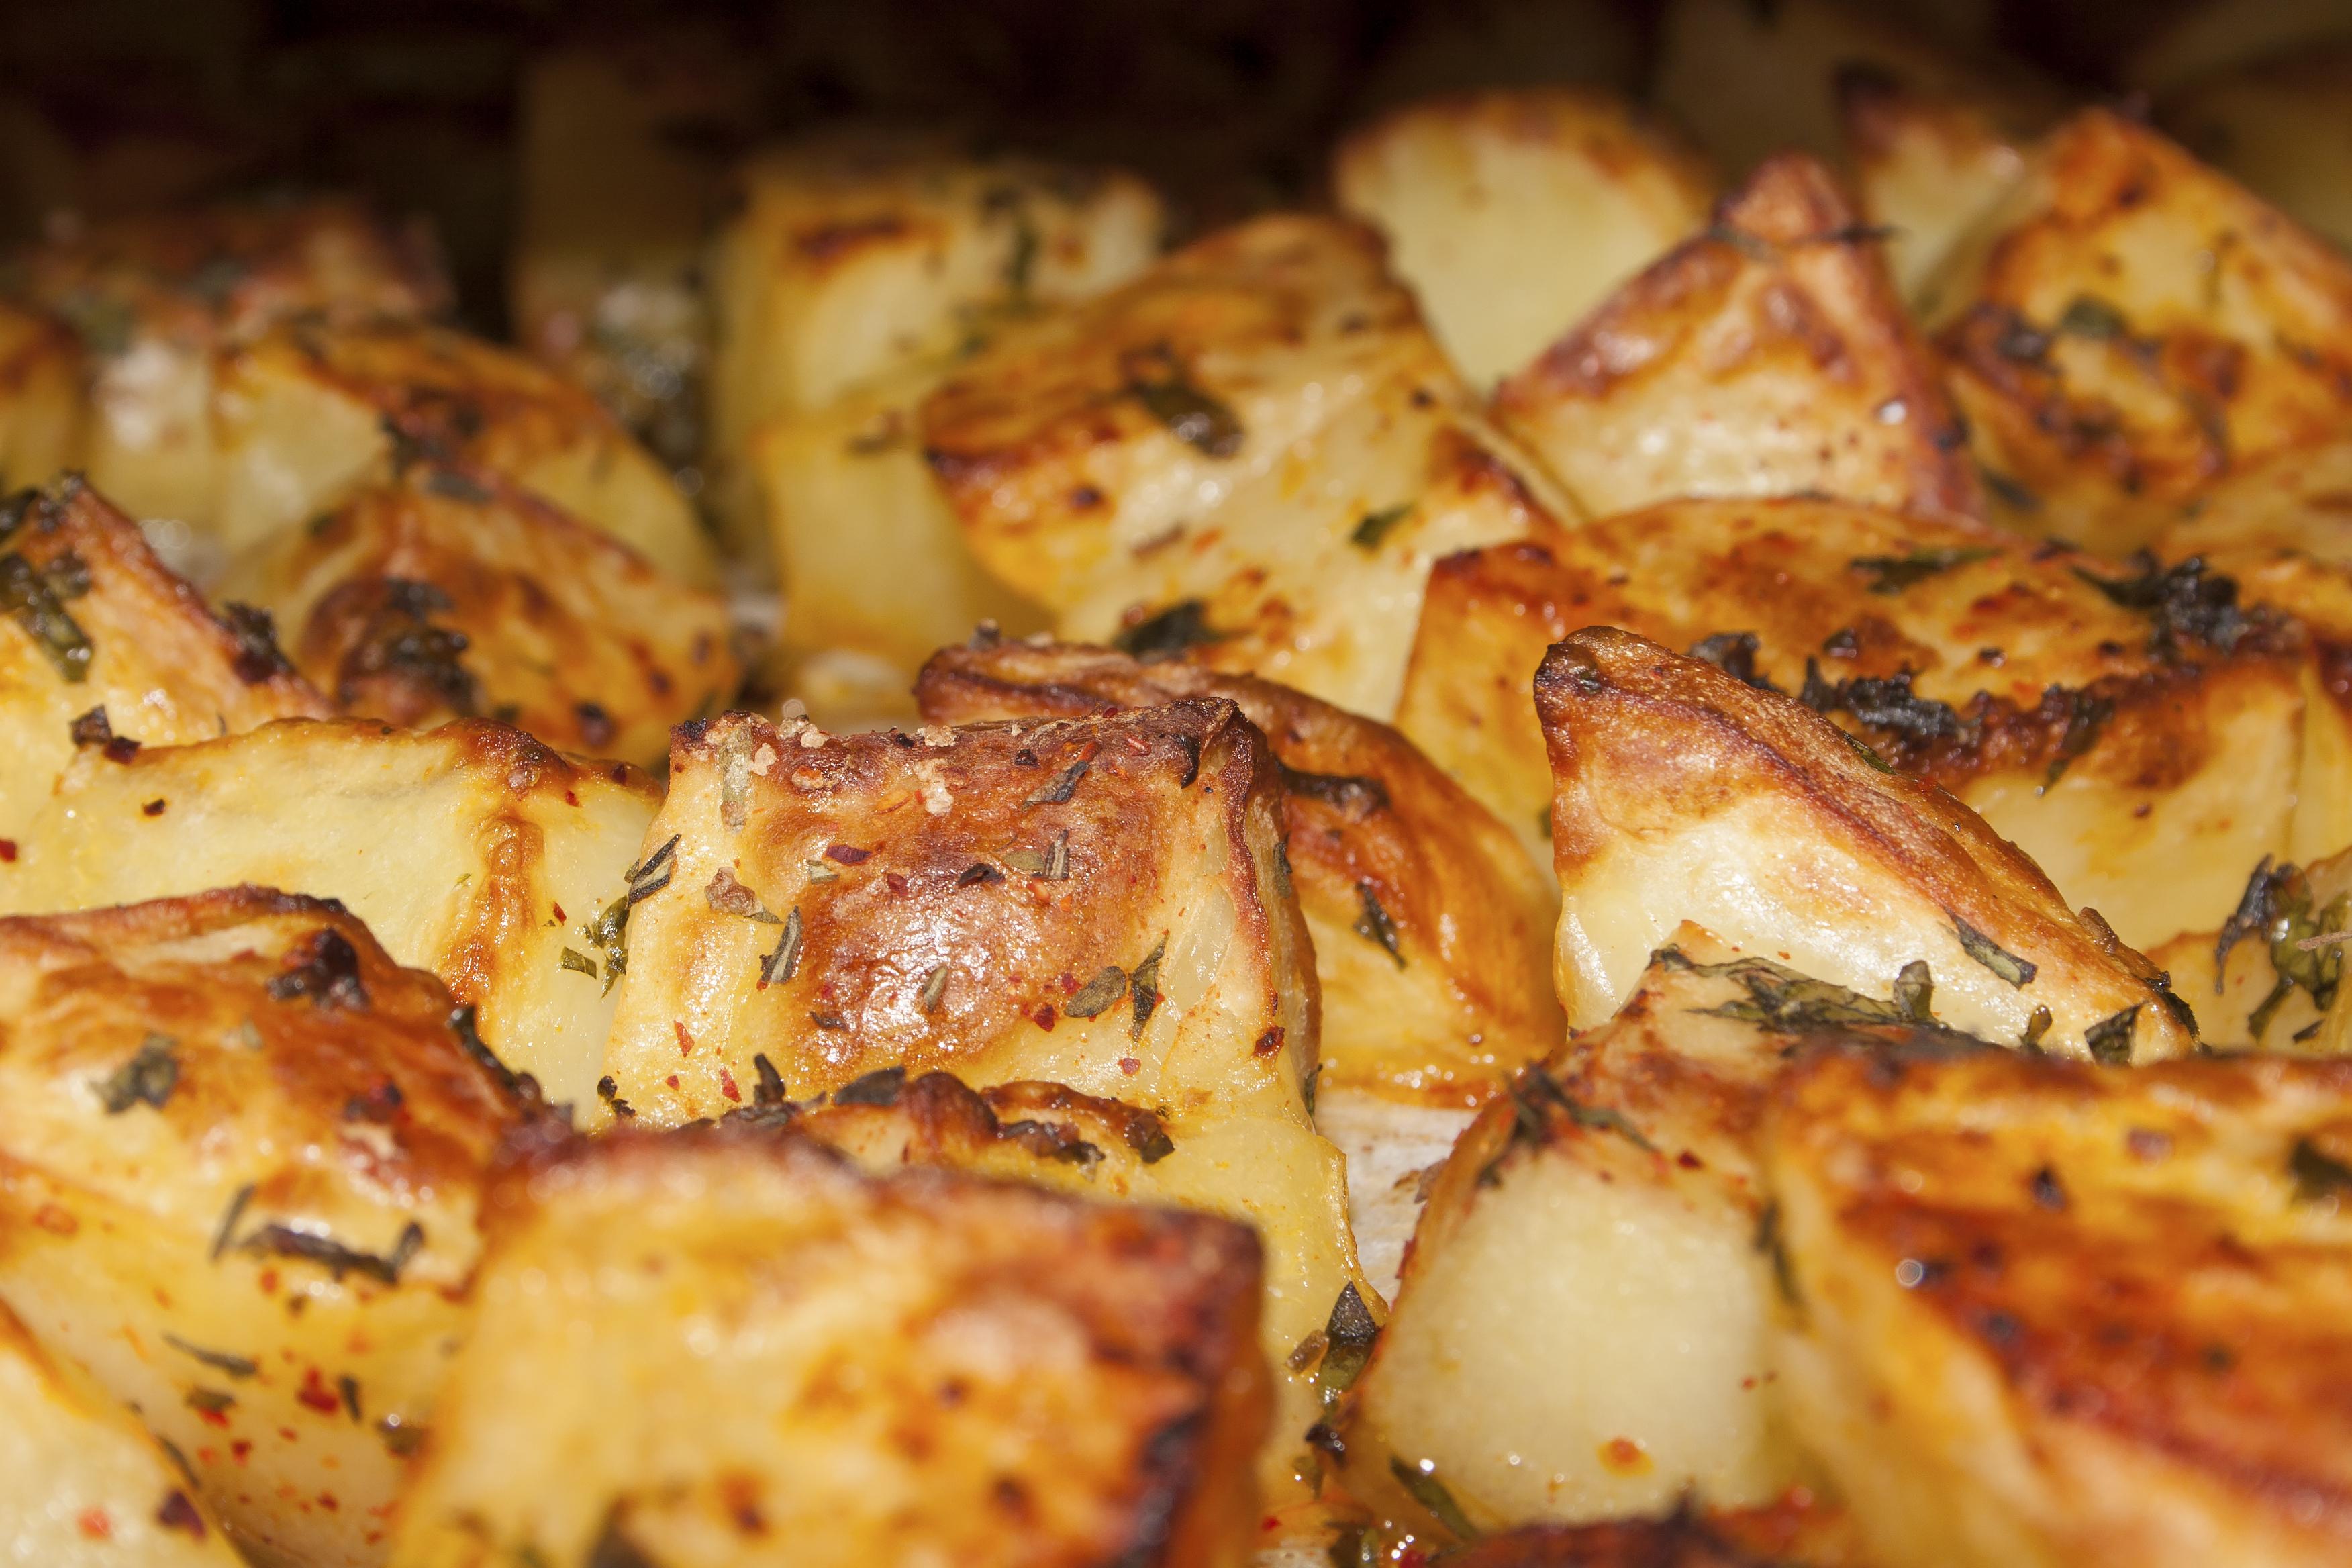 Potatoes in oven with lemon: Patata l-forn bil-lumi